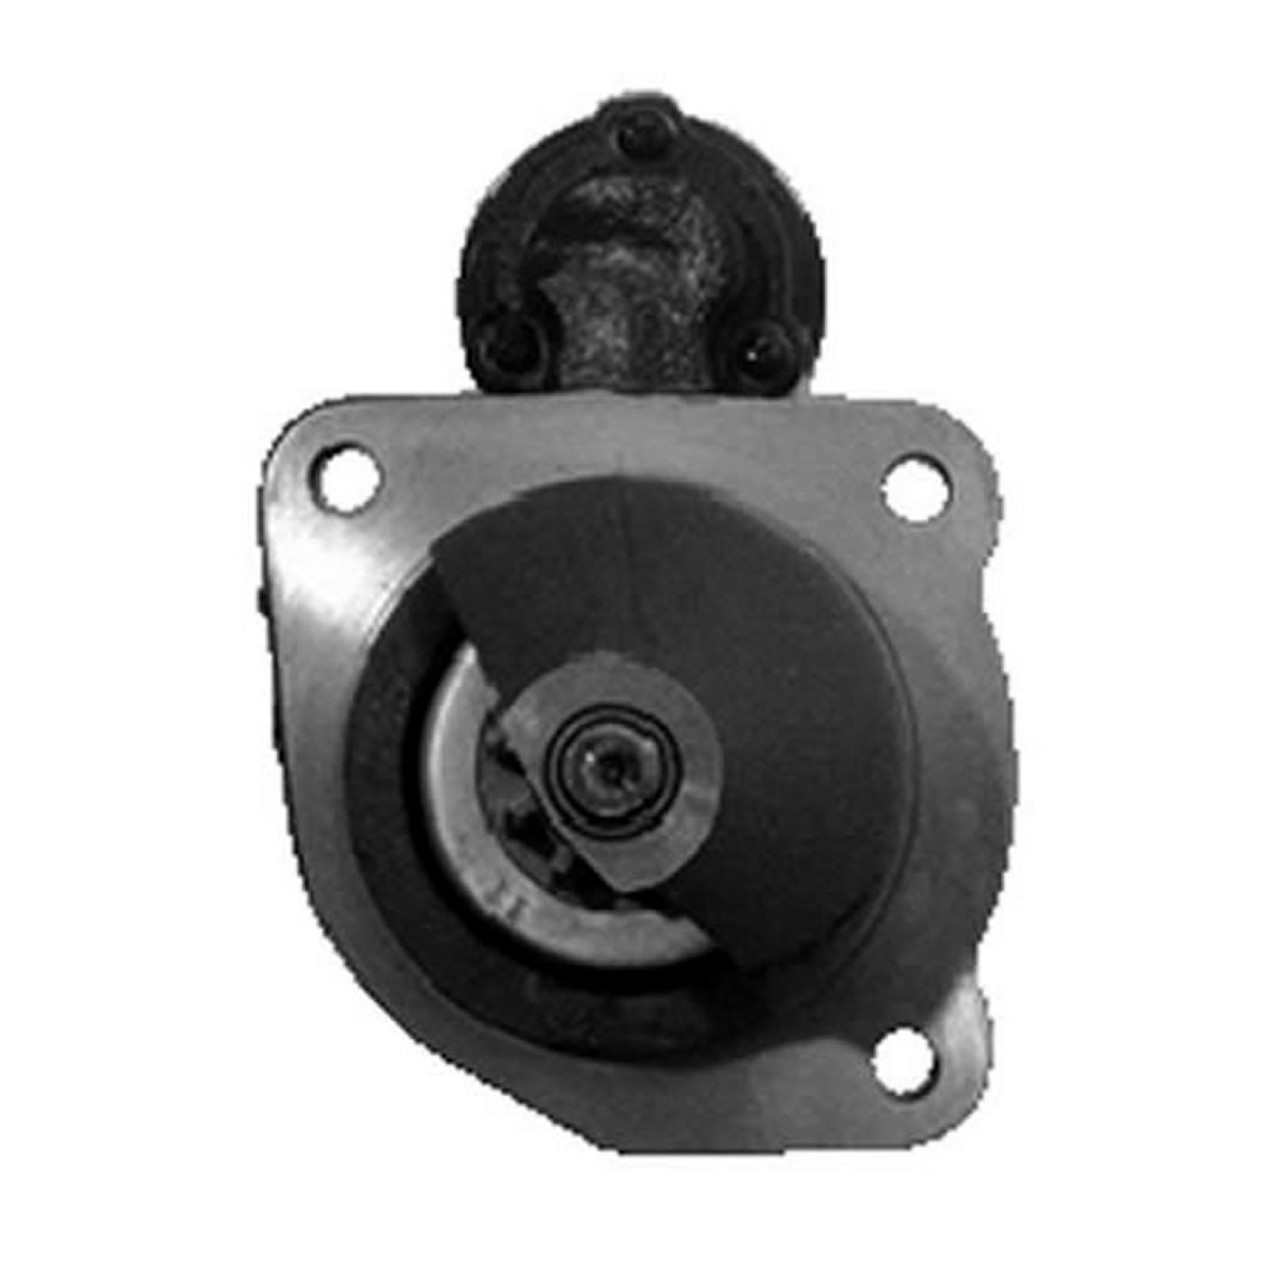 John Deere Sprayers 6700 Letrika Starter AE4189 IS1323 MS486